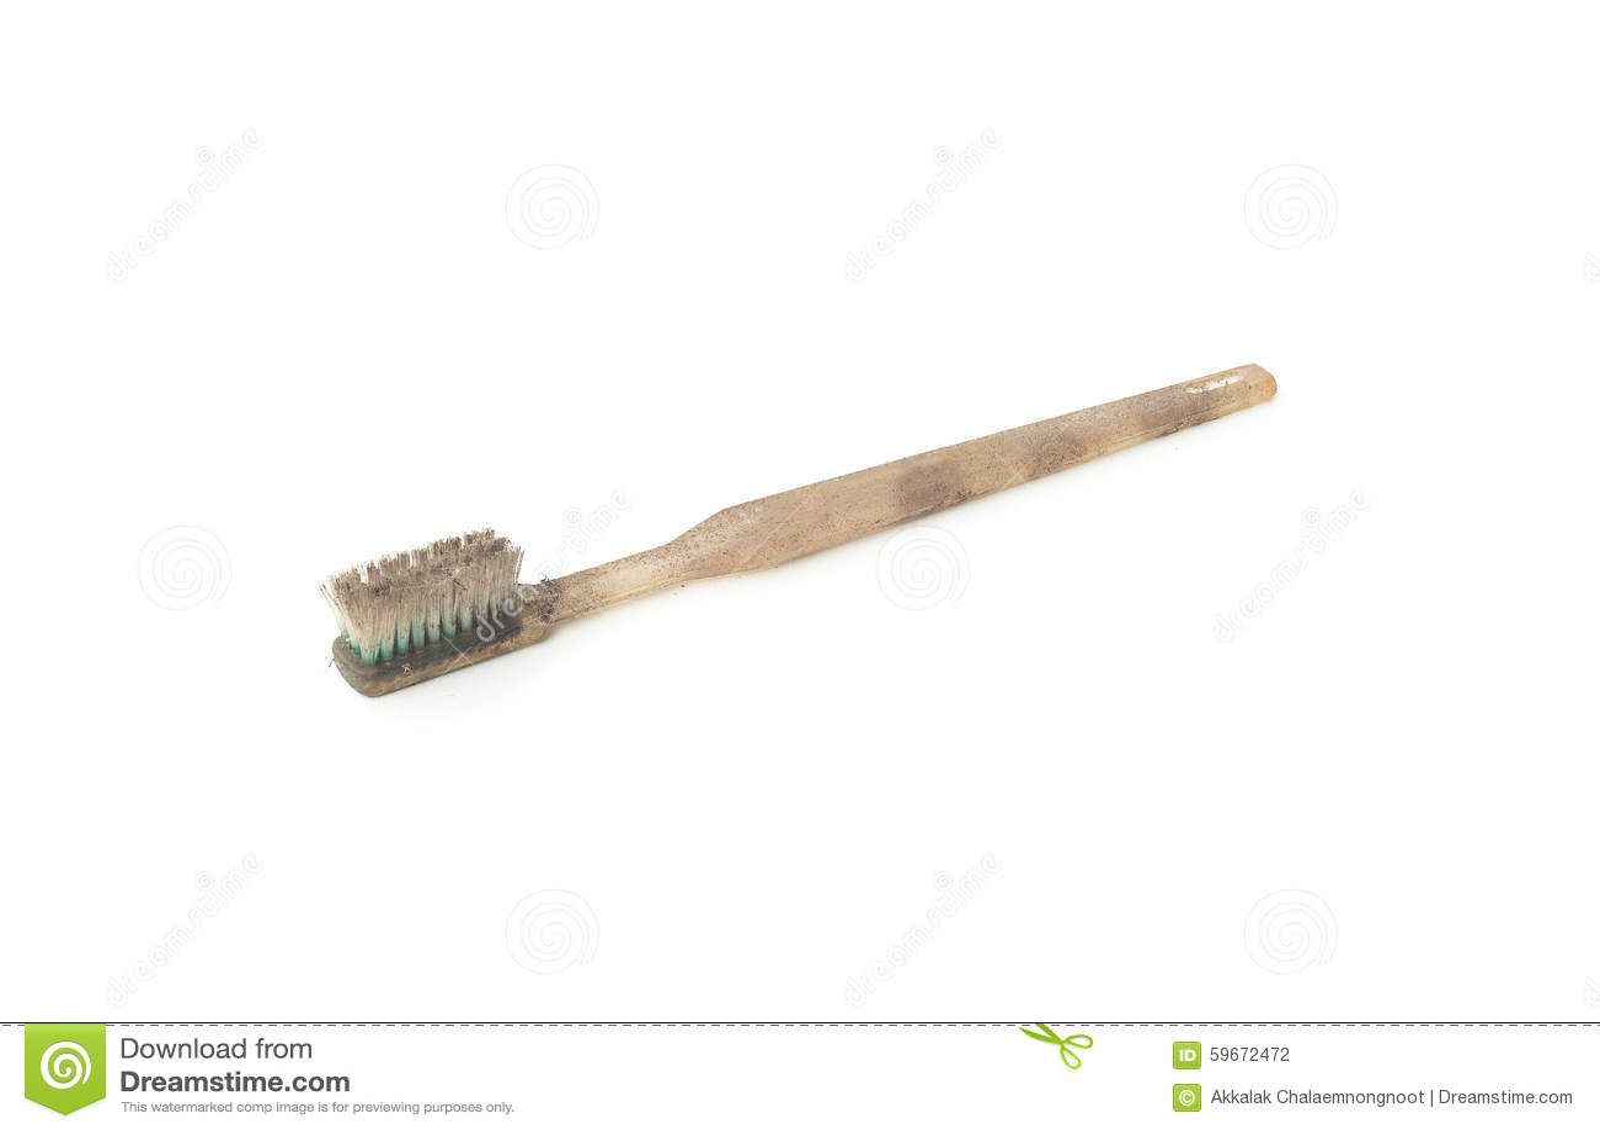 brosse dents sale et utilis e photo stock image 59672472. Black Bedroom Furniture Sets. Home Design Ideas